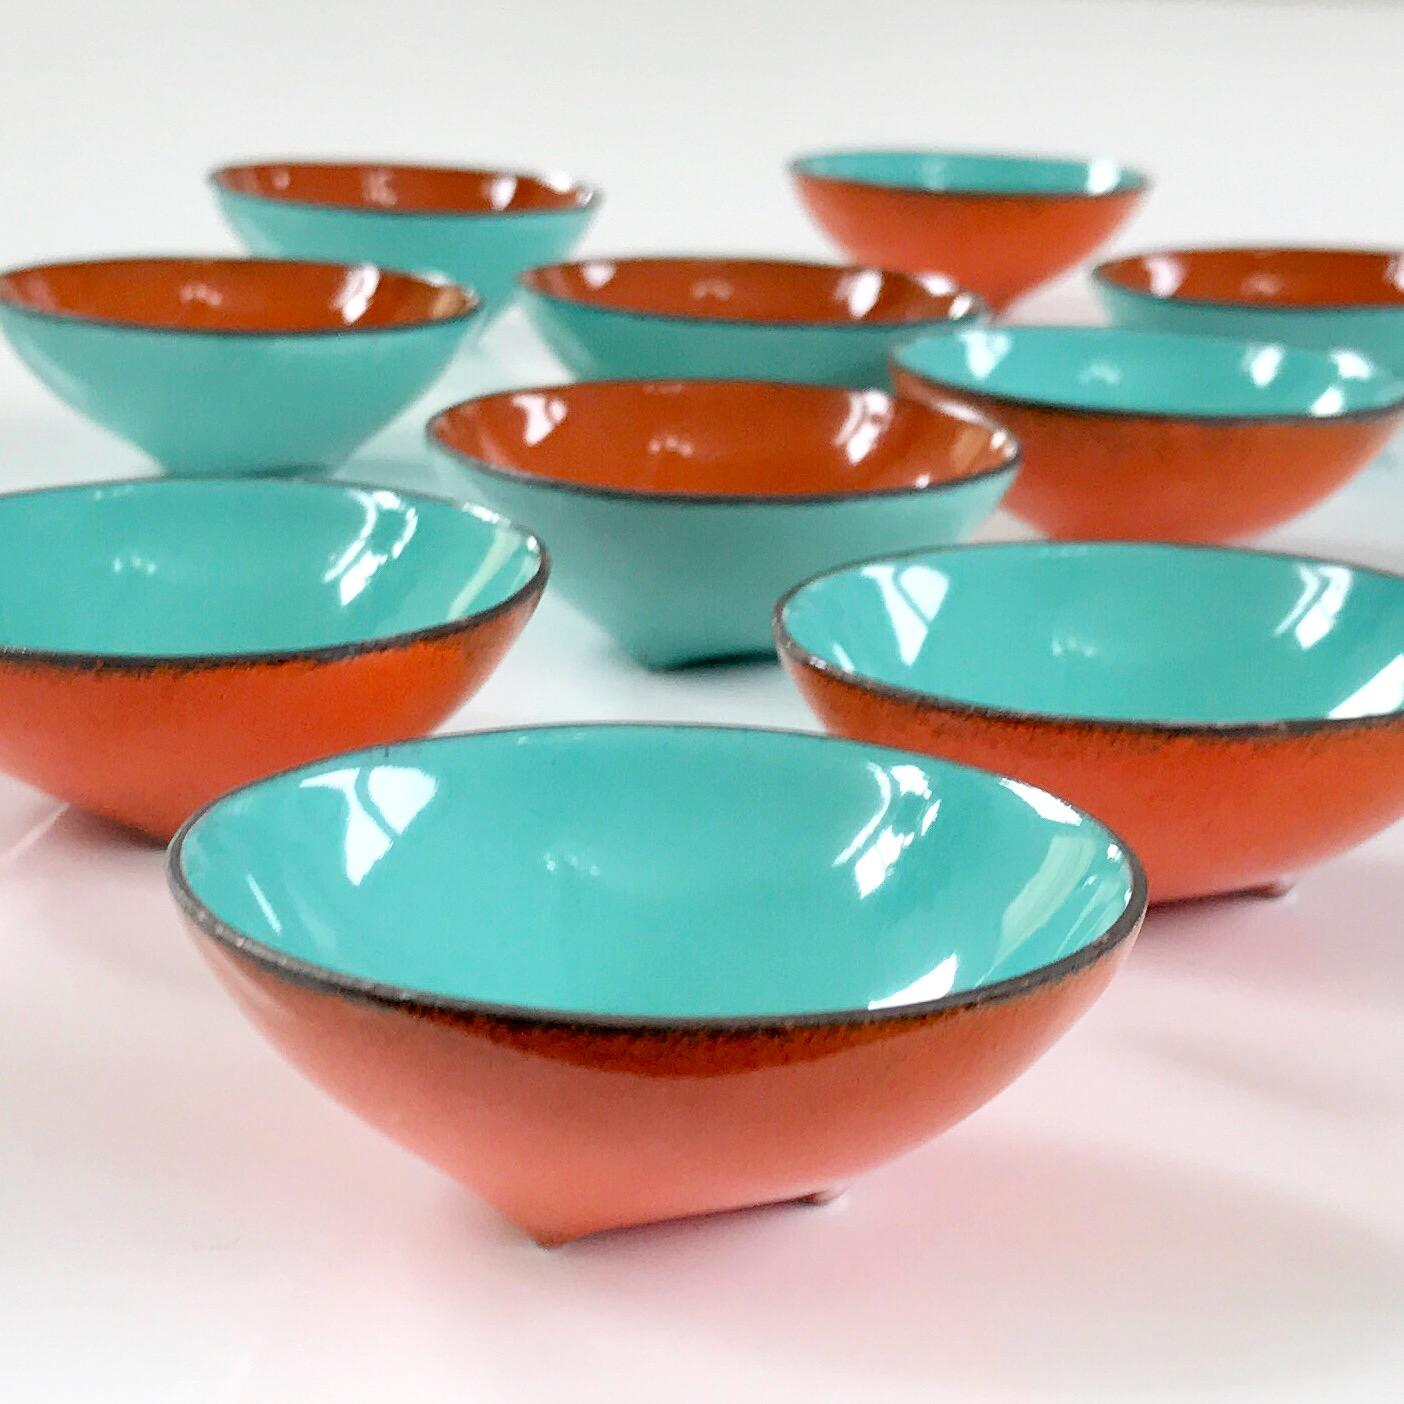 CG-Grisez-bitty bowl-orange-aqua